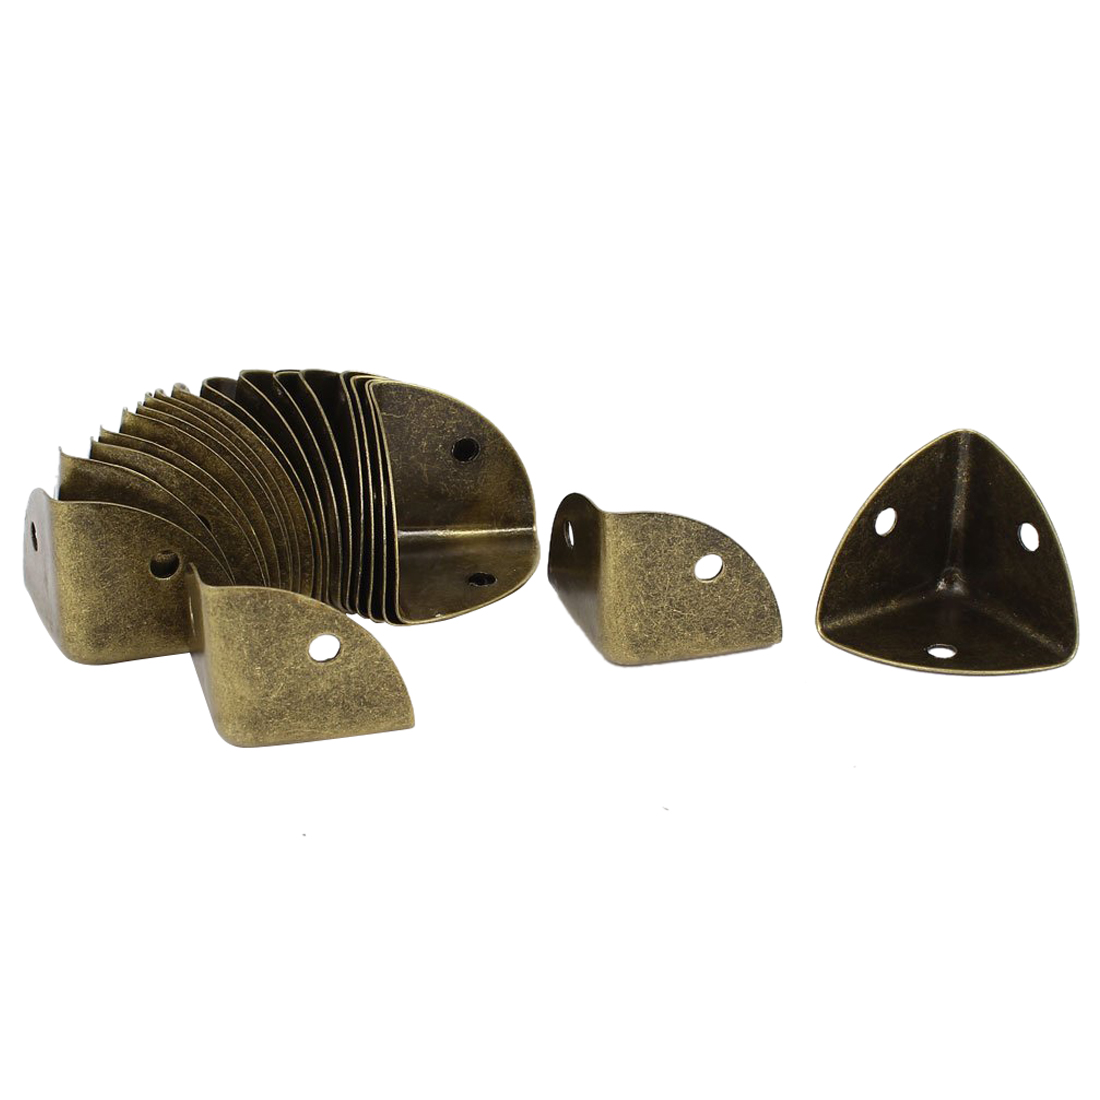 HOT GCZW- Box Case Edge Corner Protector Bracket 20 Pcs Bronze Tone